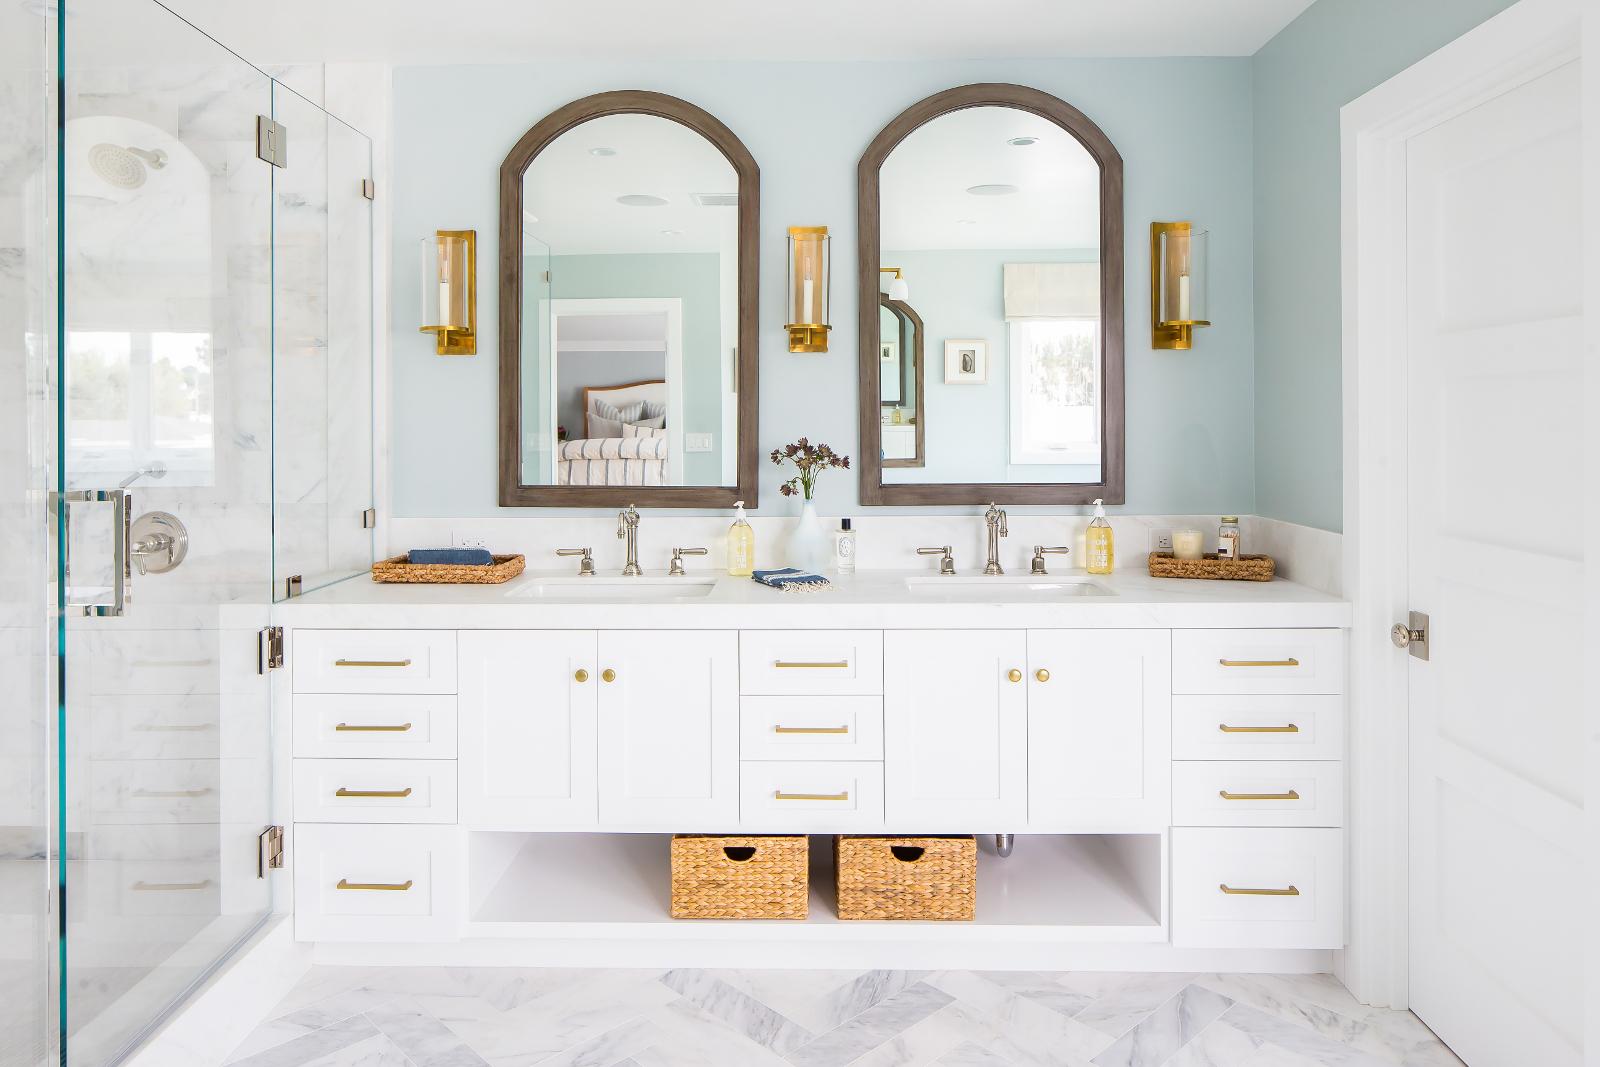 Wagner Design designer spotlight: brooke wagner design - provident home design